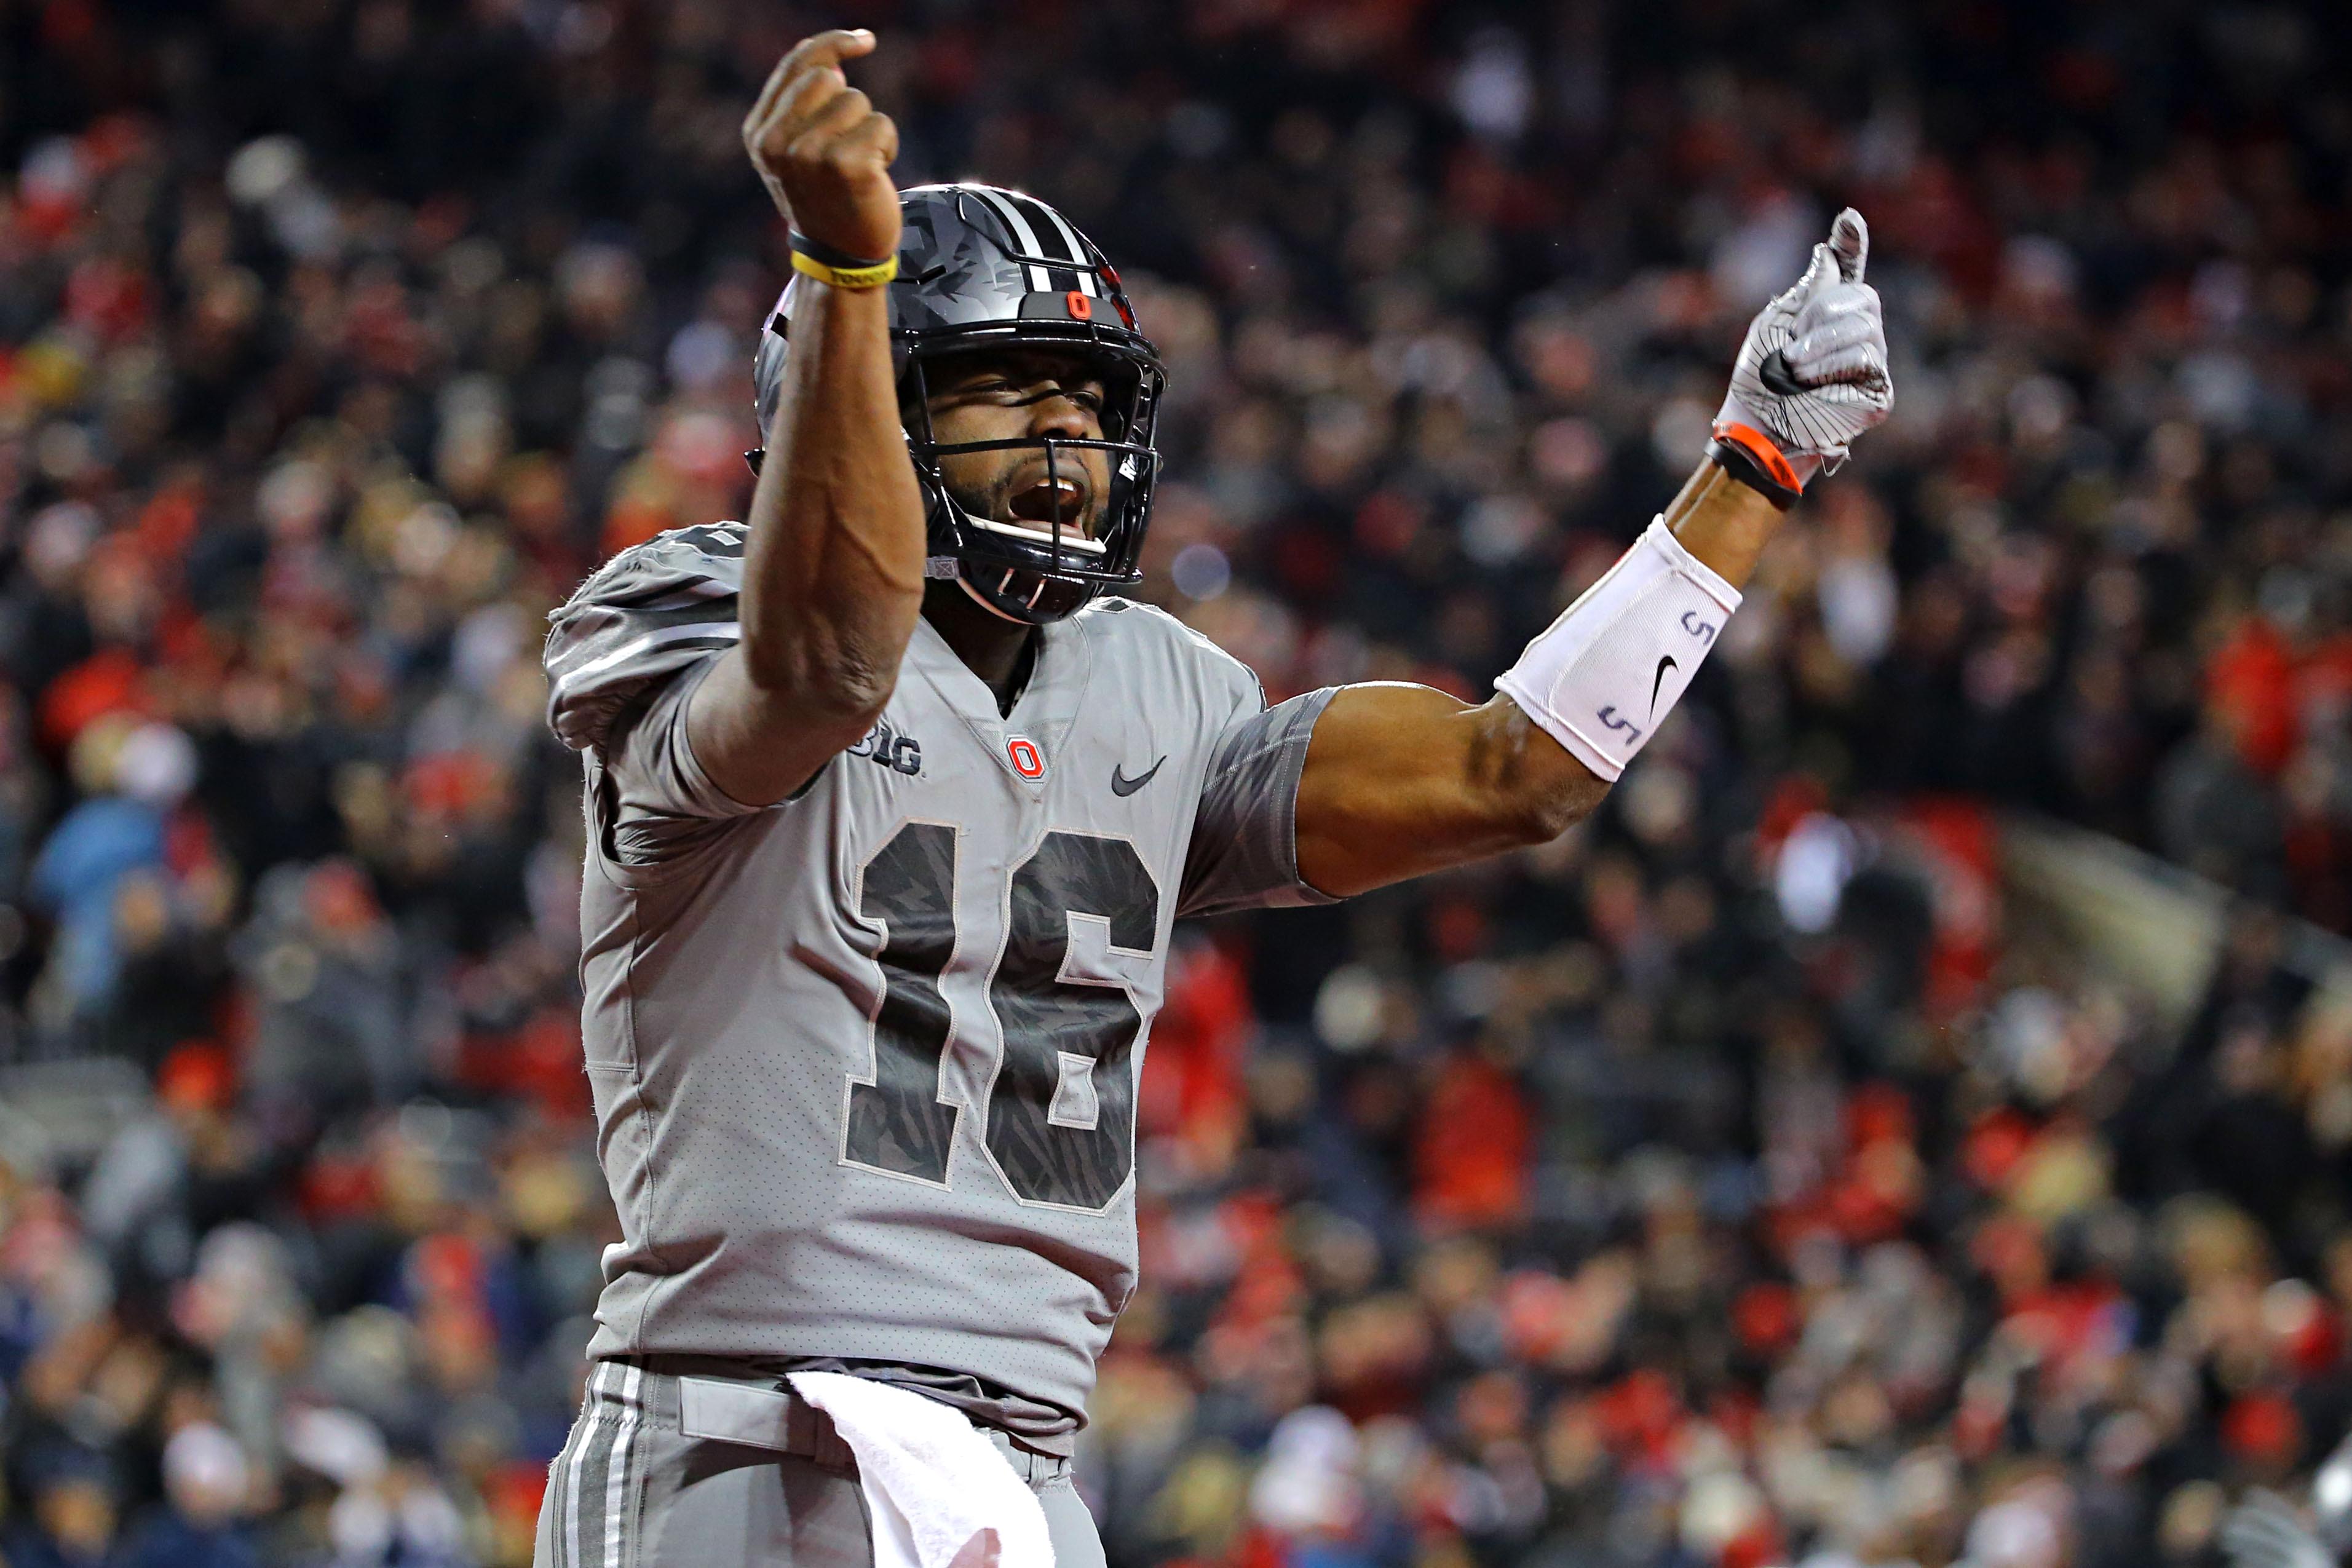 NCAA Football: Penn State at Ohio State